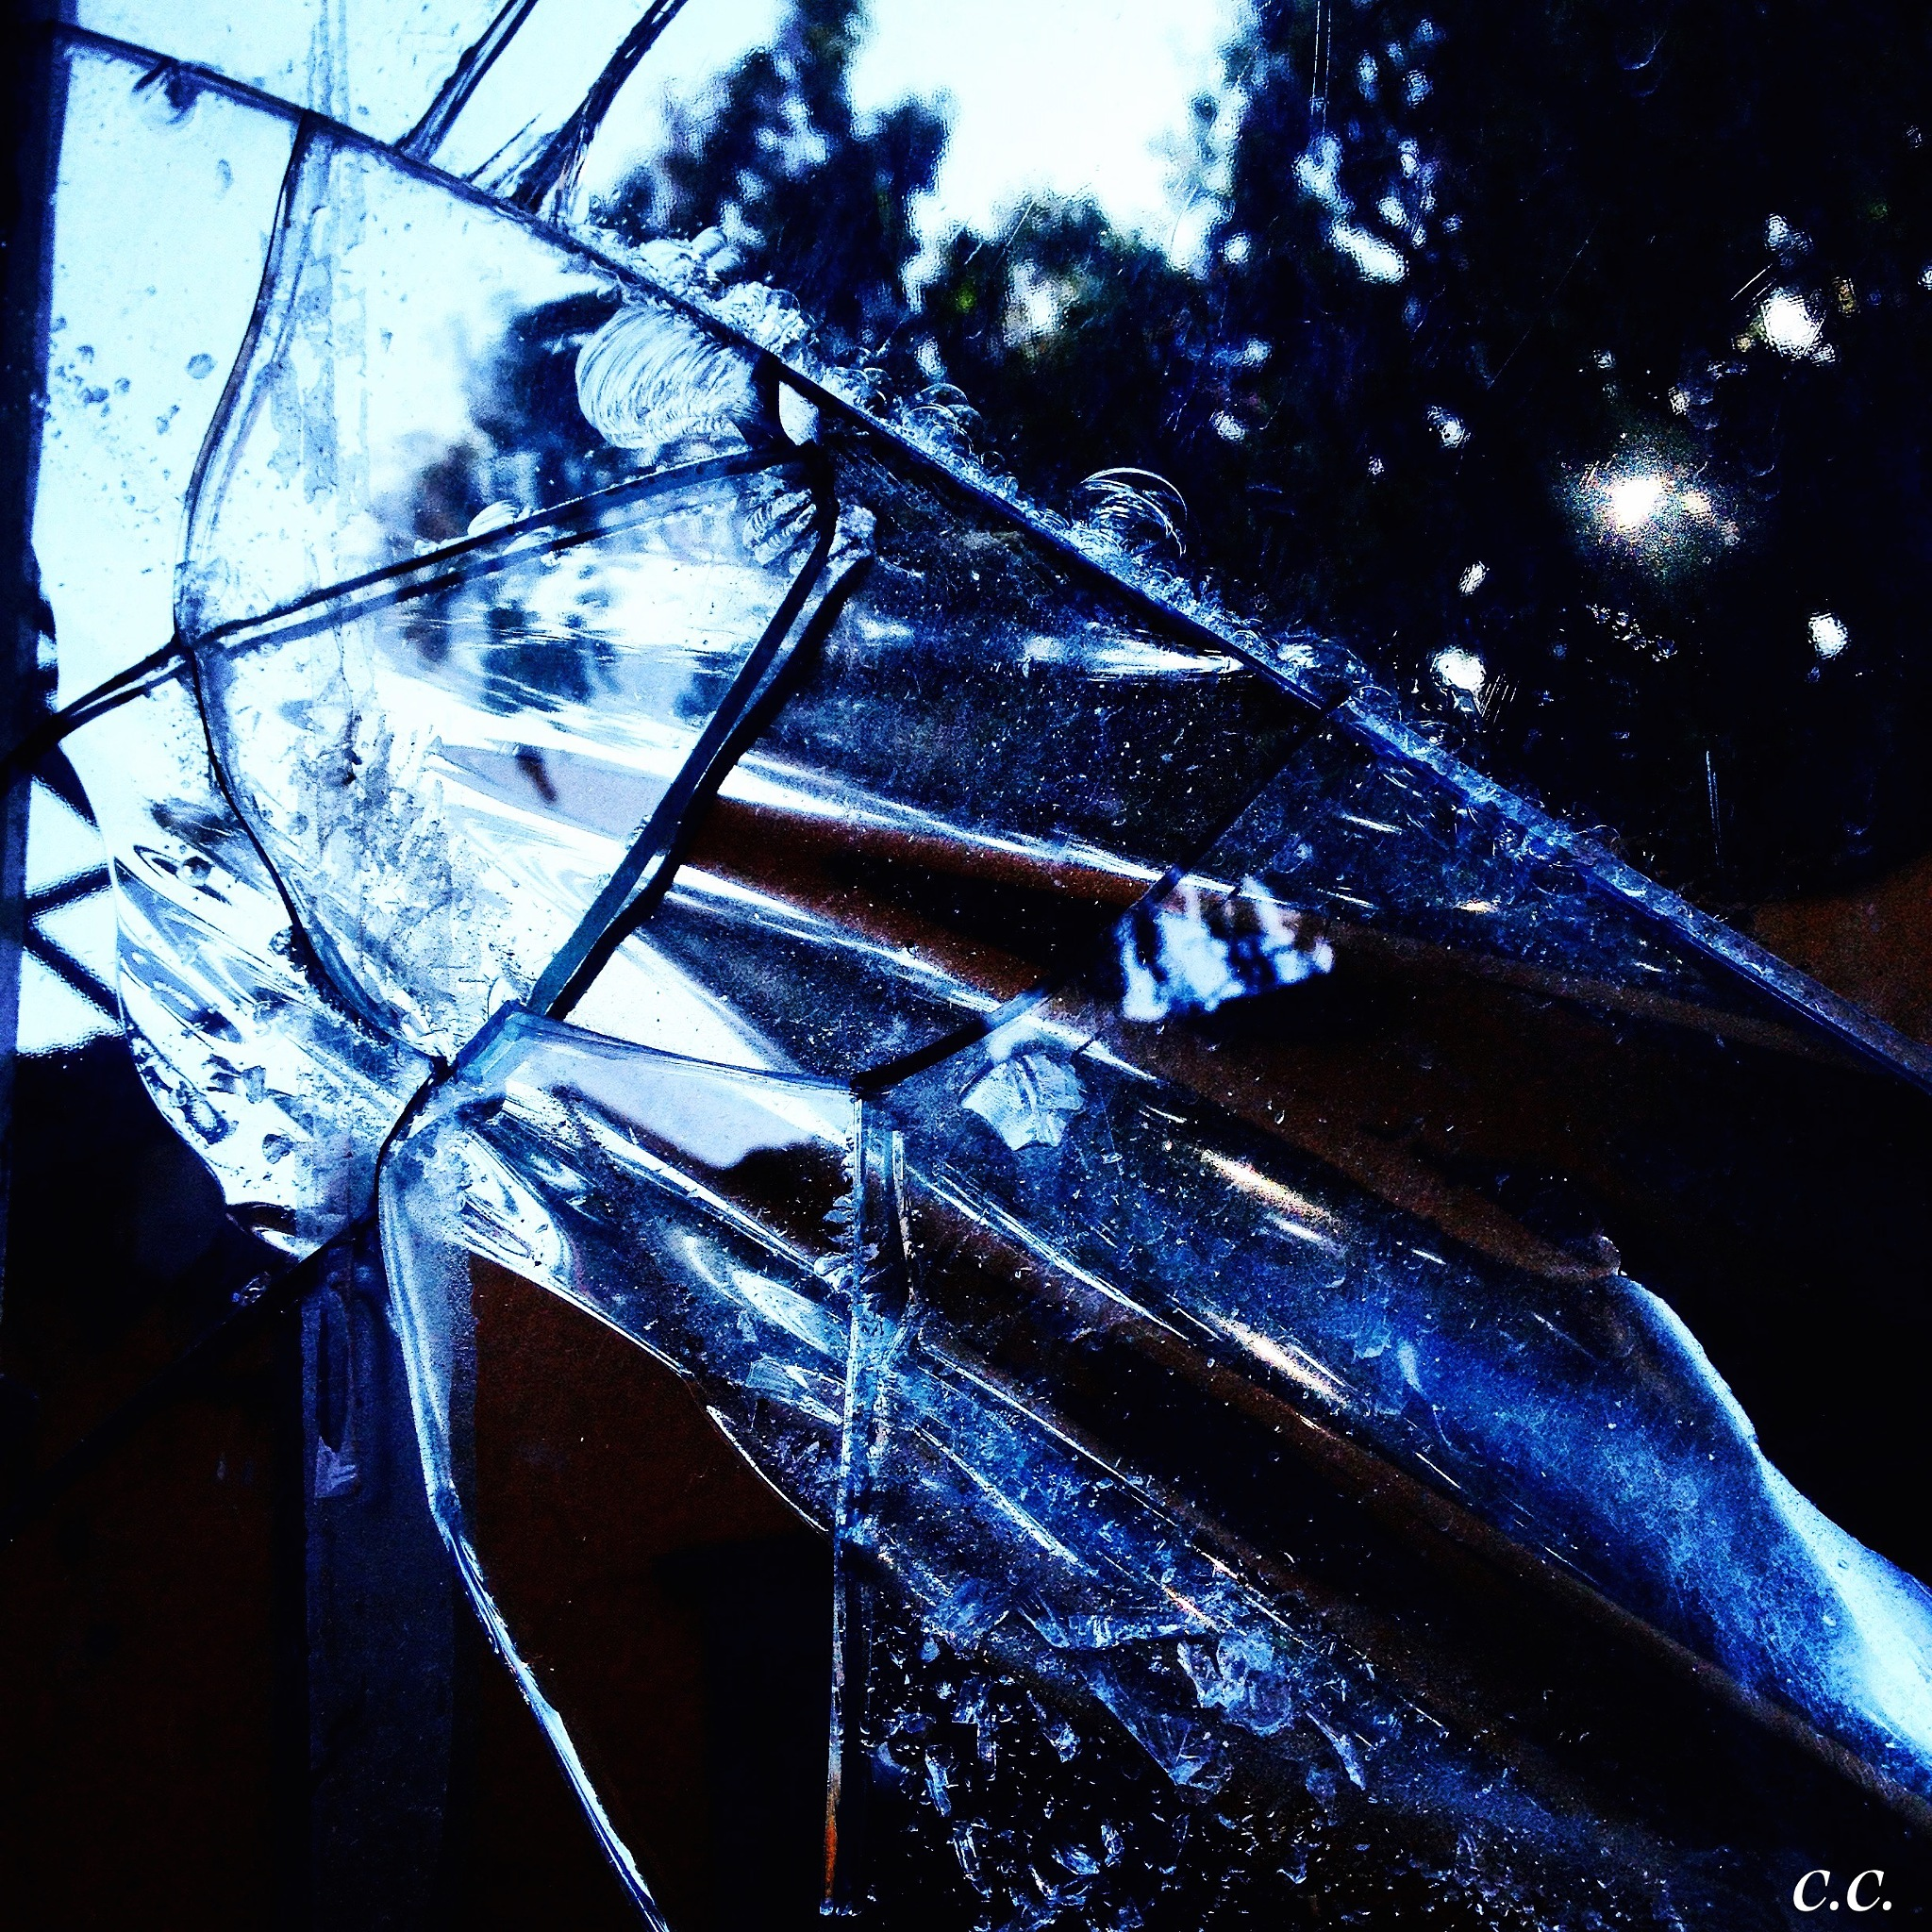 Éclat by Constance Chmld